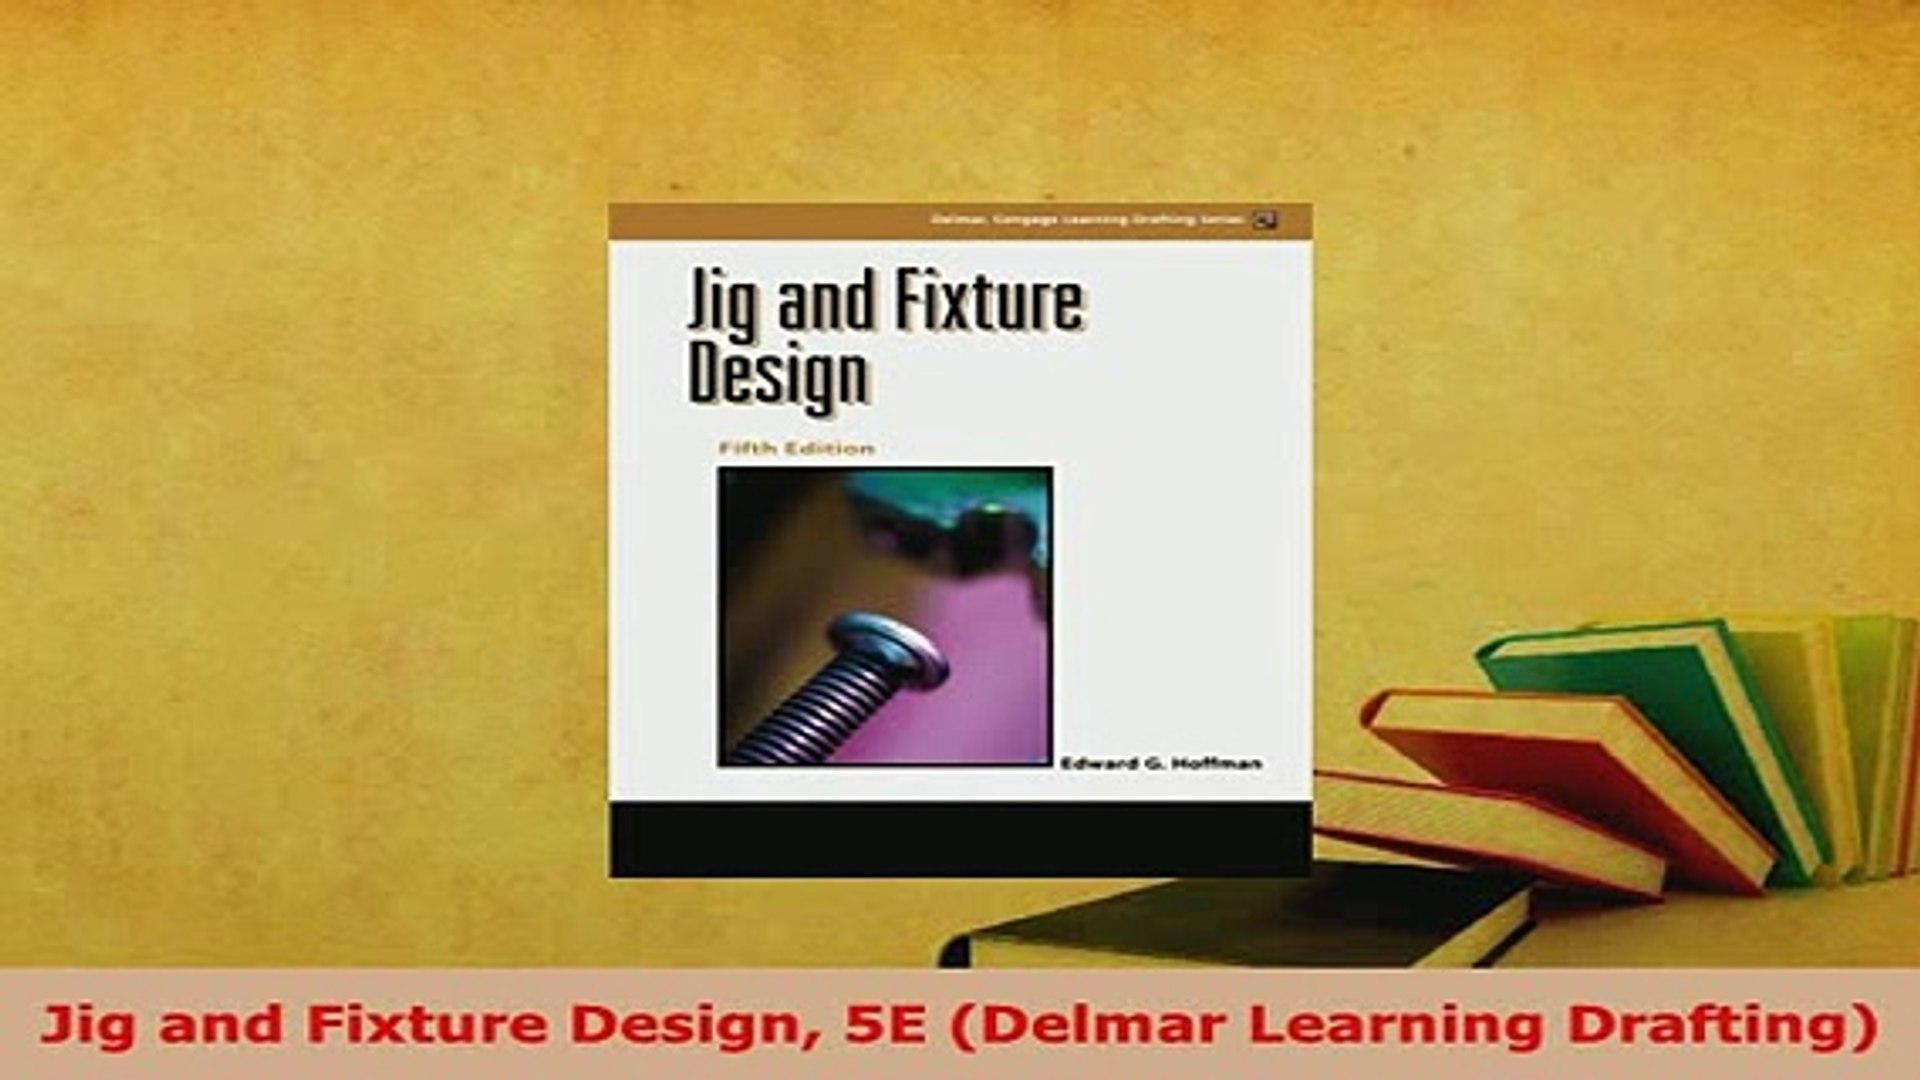 5E Jig and Fixture Design